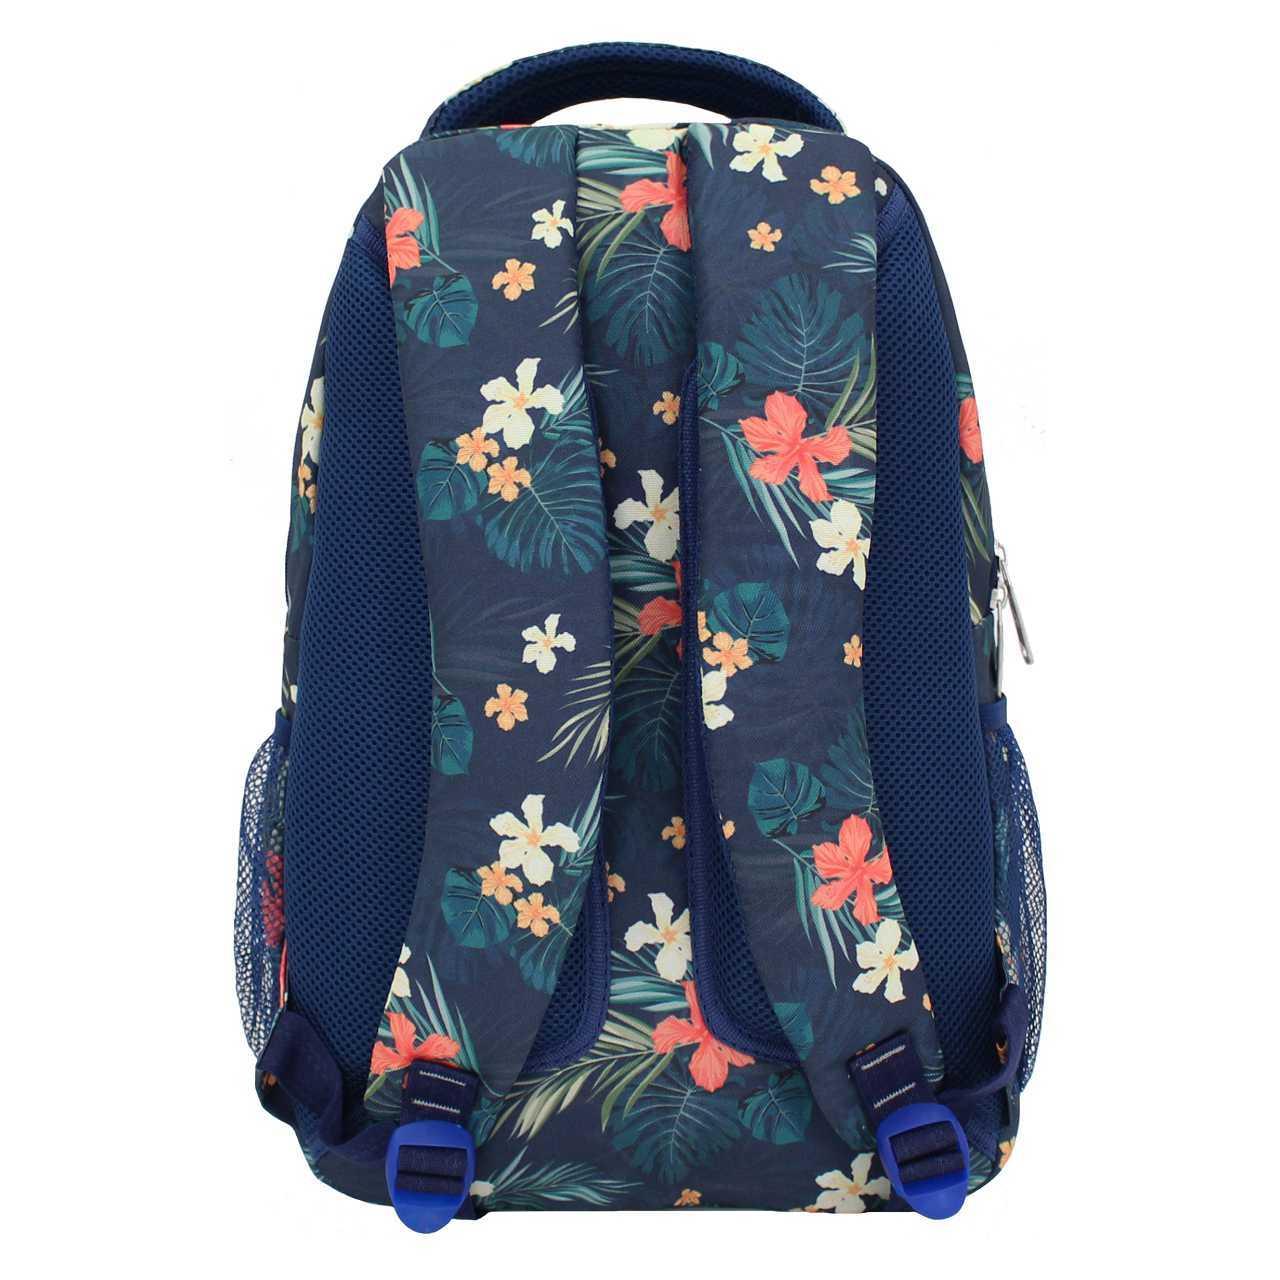 Рюкзак Bagland Лик 21 л. сублимация (цветы) (00557664)